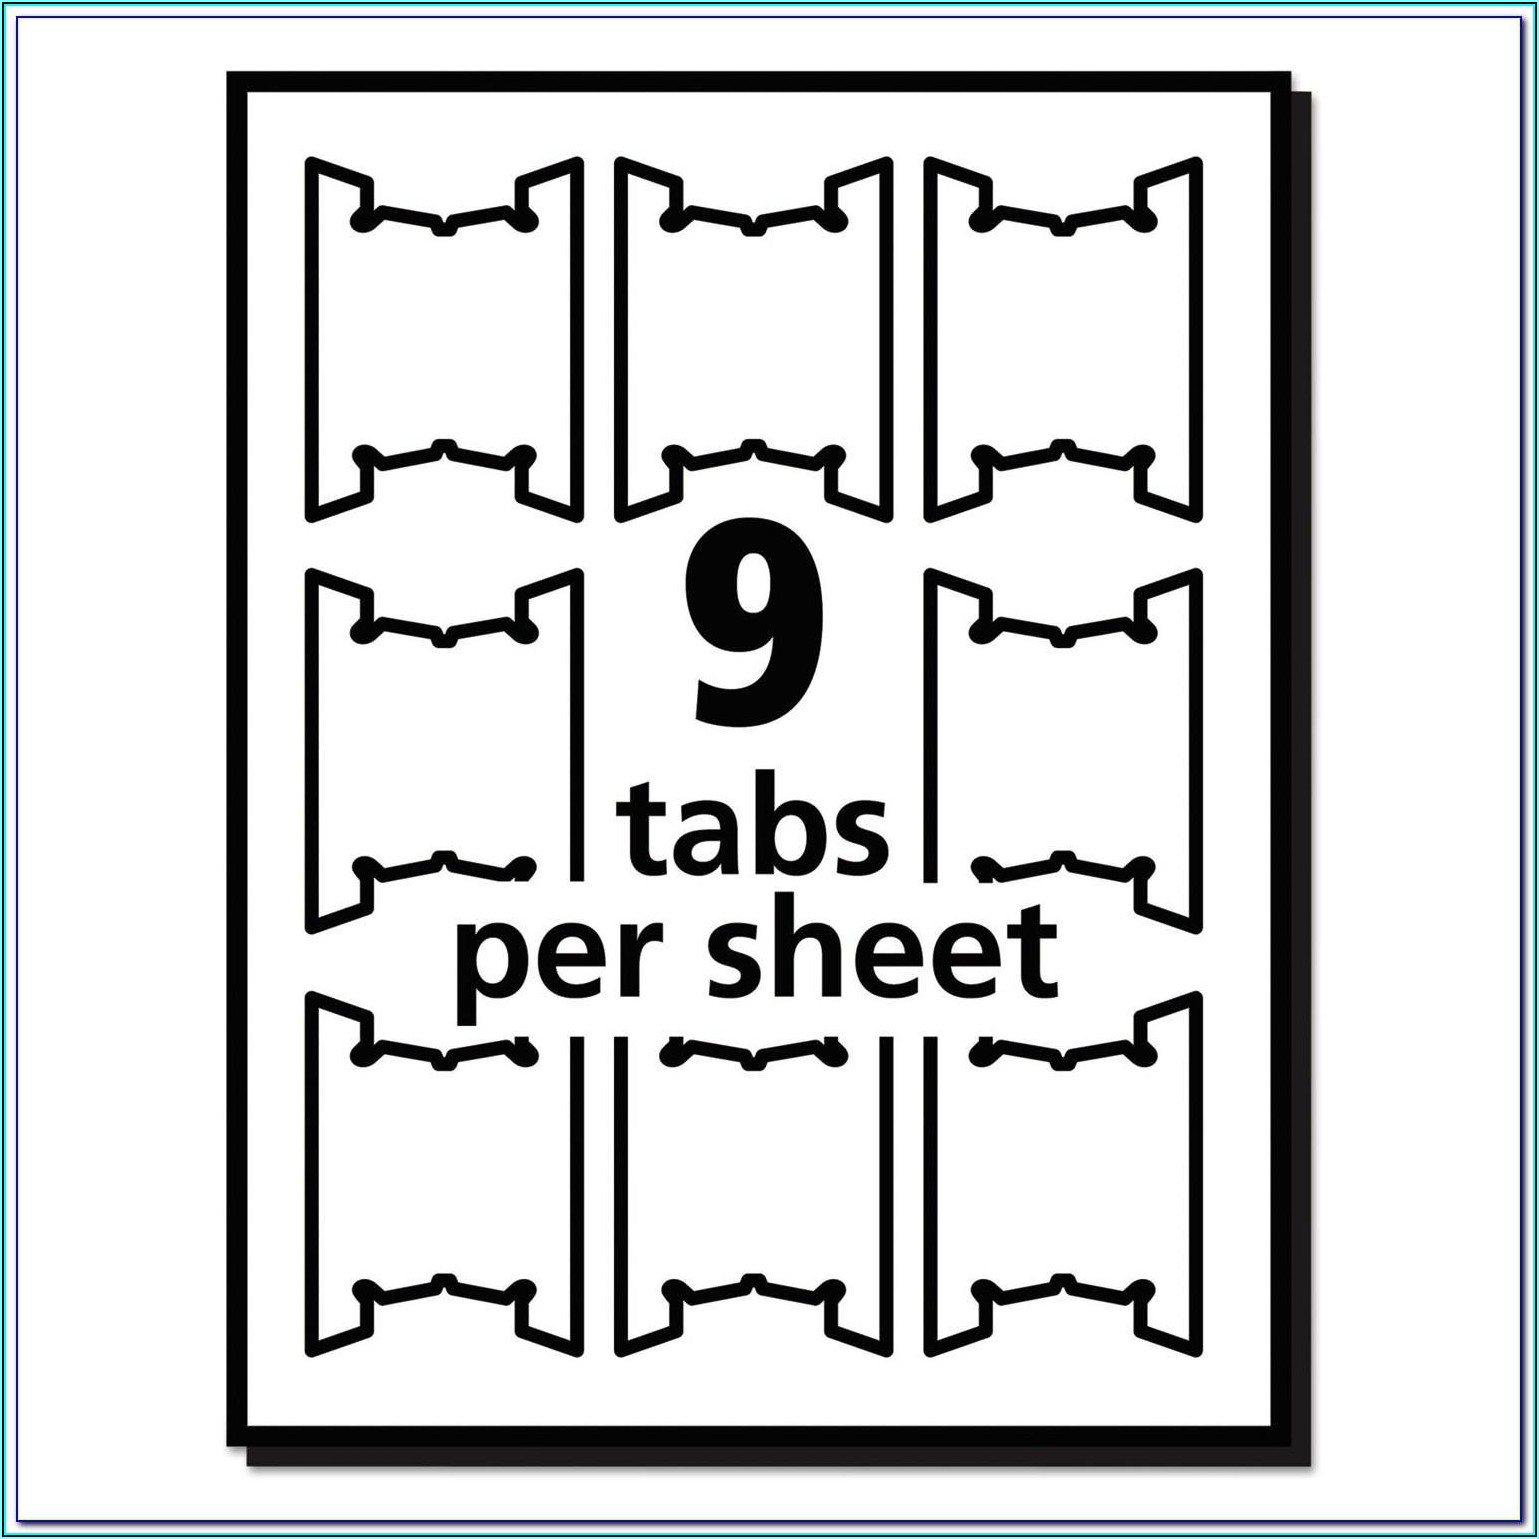 Smead Hanging File Folder Tab Template